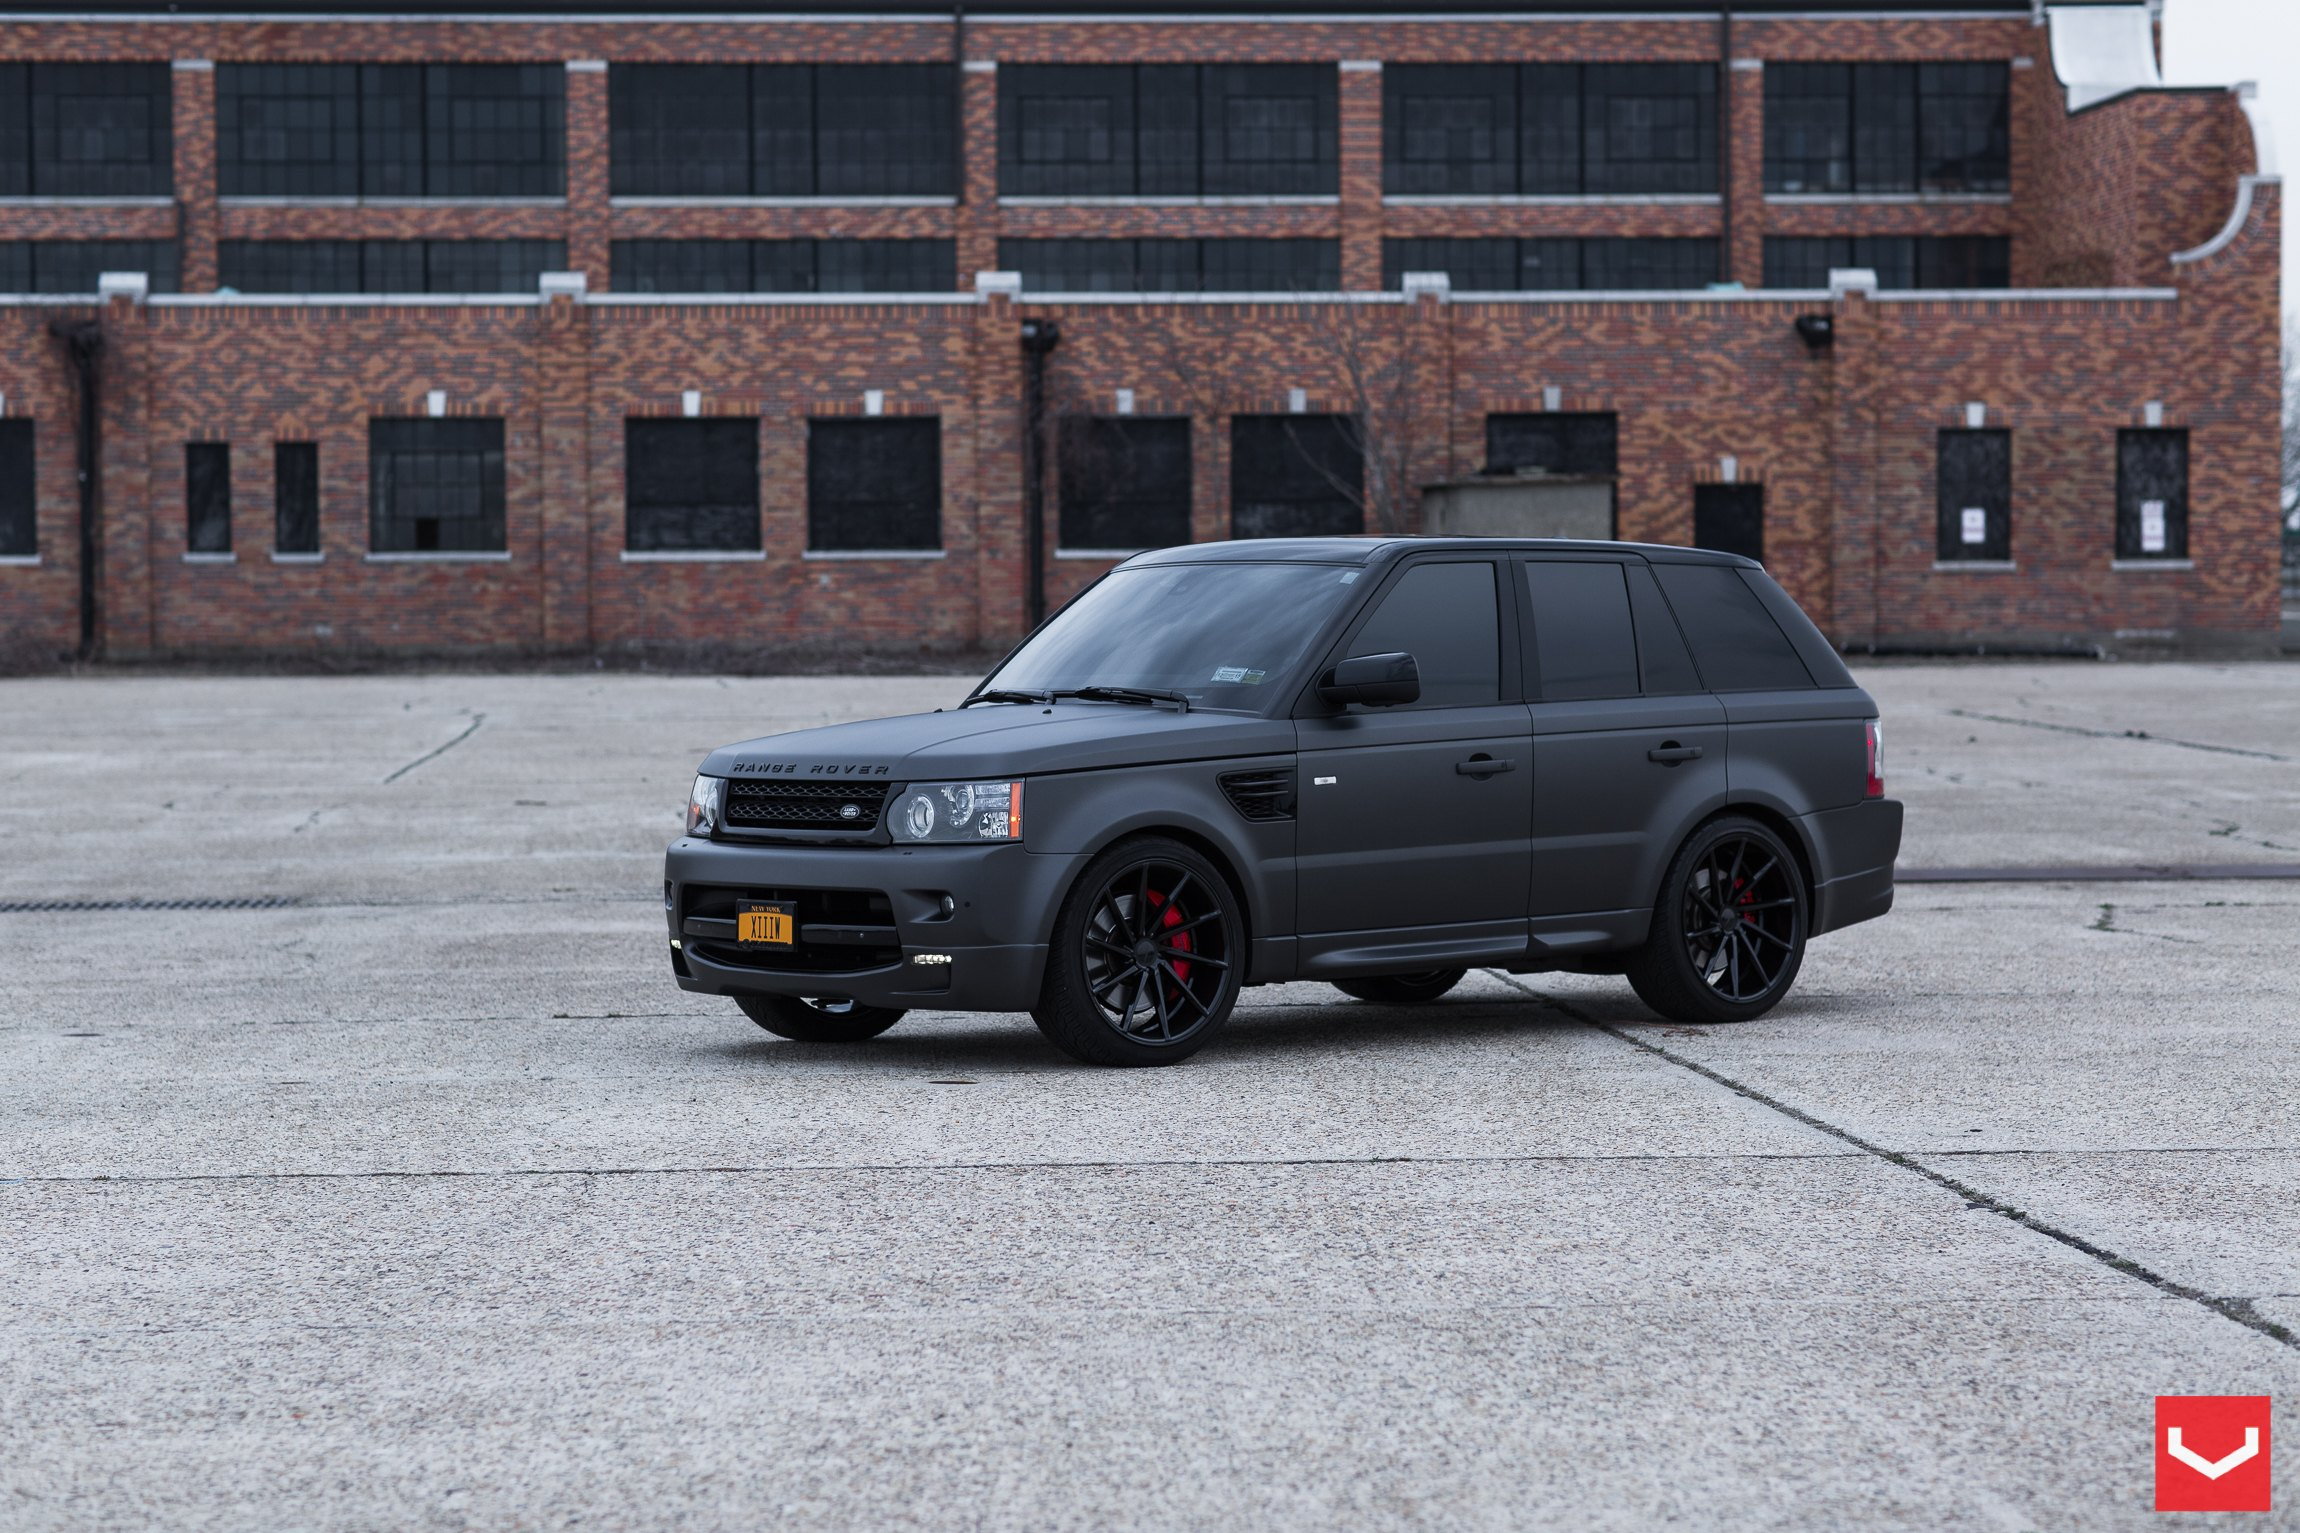 Black on Black Matte Land Rover Range Rover Sport with Custom